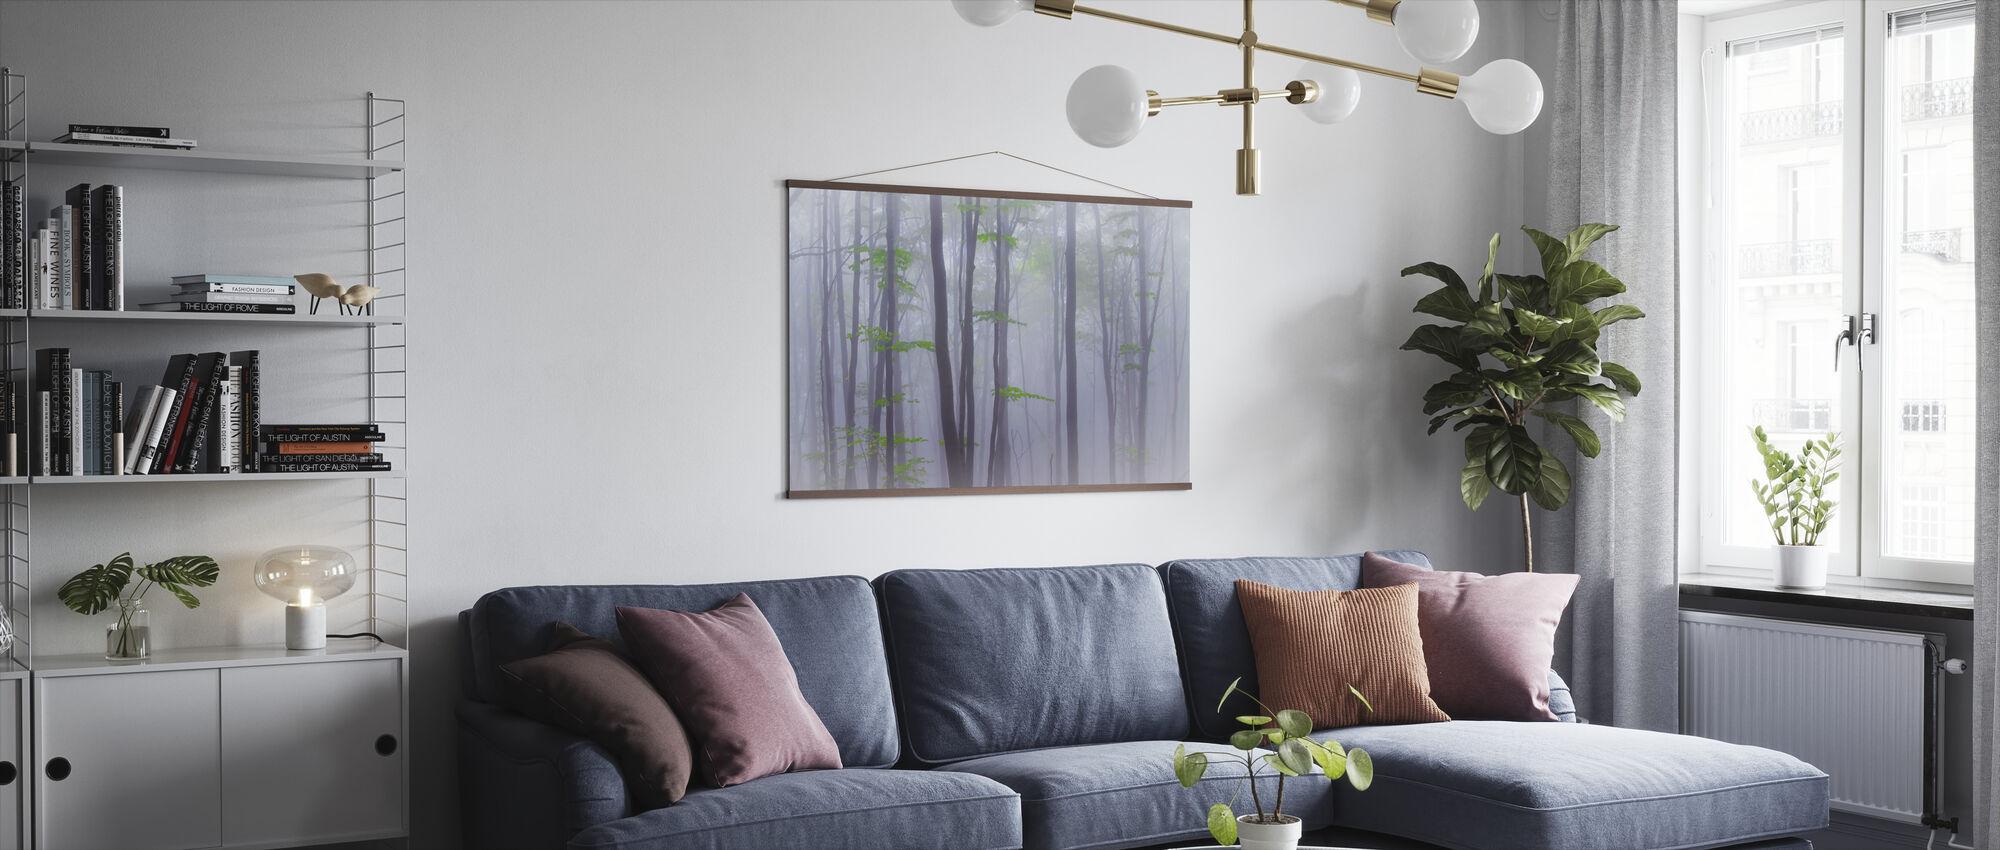 Misty Woods - Poster - Living Room